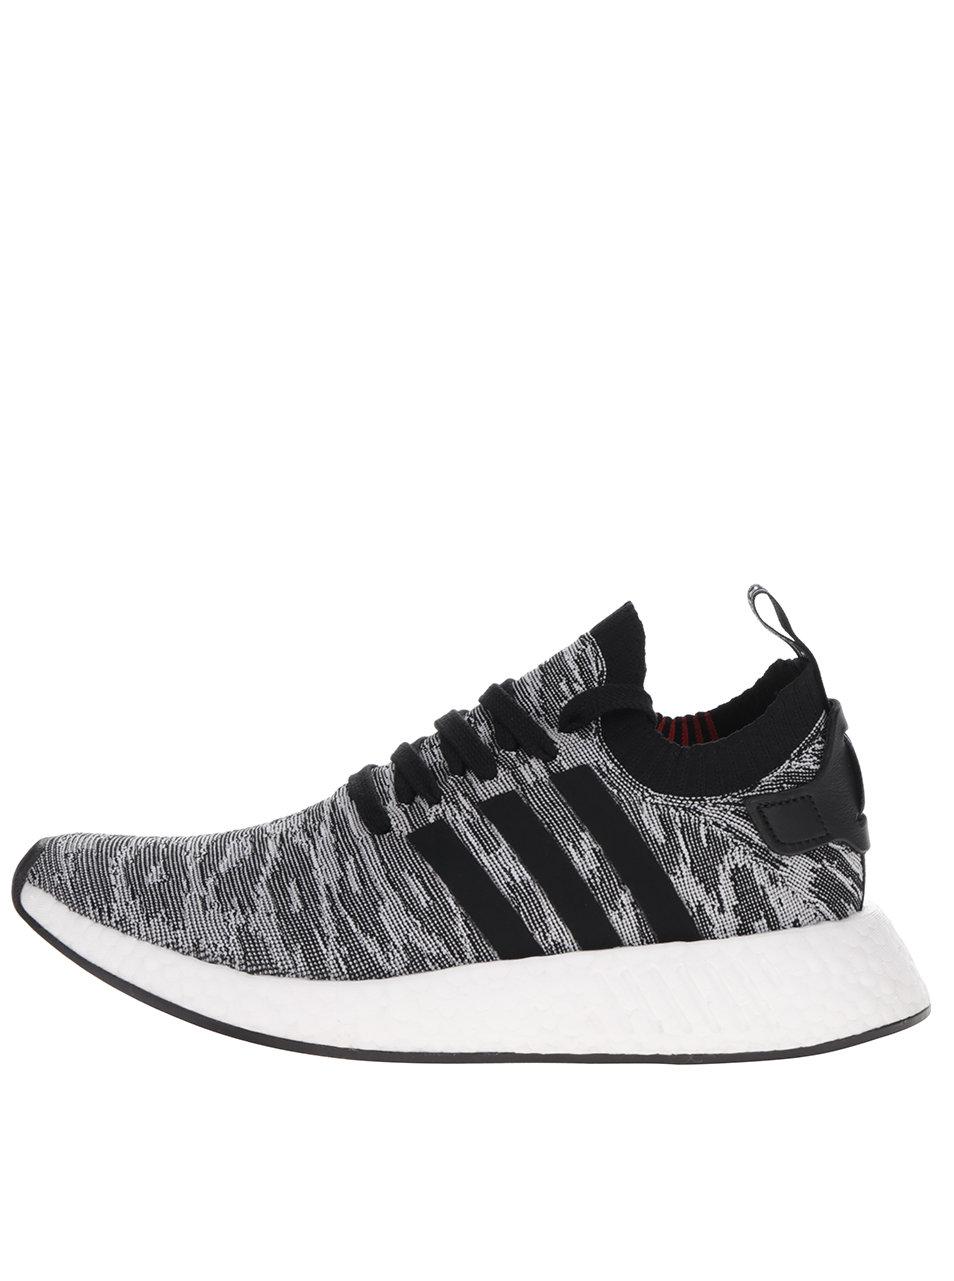 Černo-bílé pánské žíhané tenisky adidas Originals NMD ... 8c1f358af0